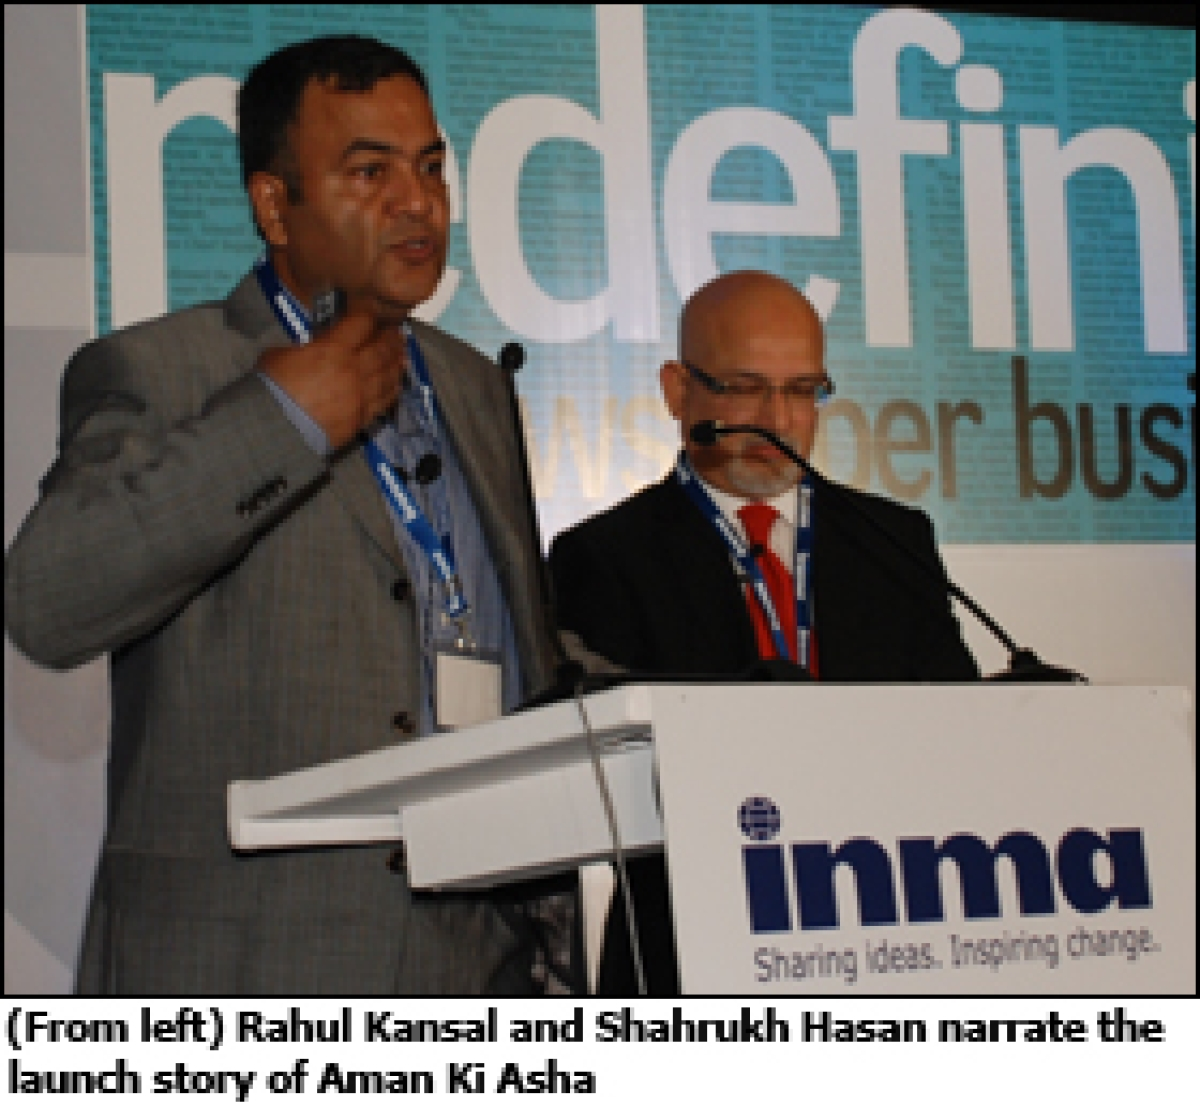 INMA 4th Annual Conference: A 'brand' new look at Aman Ki Asha